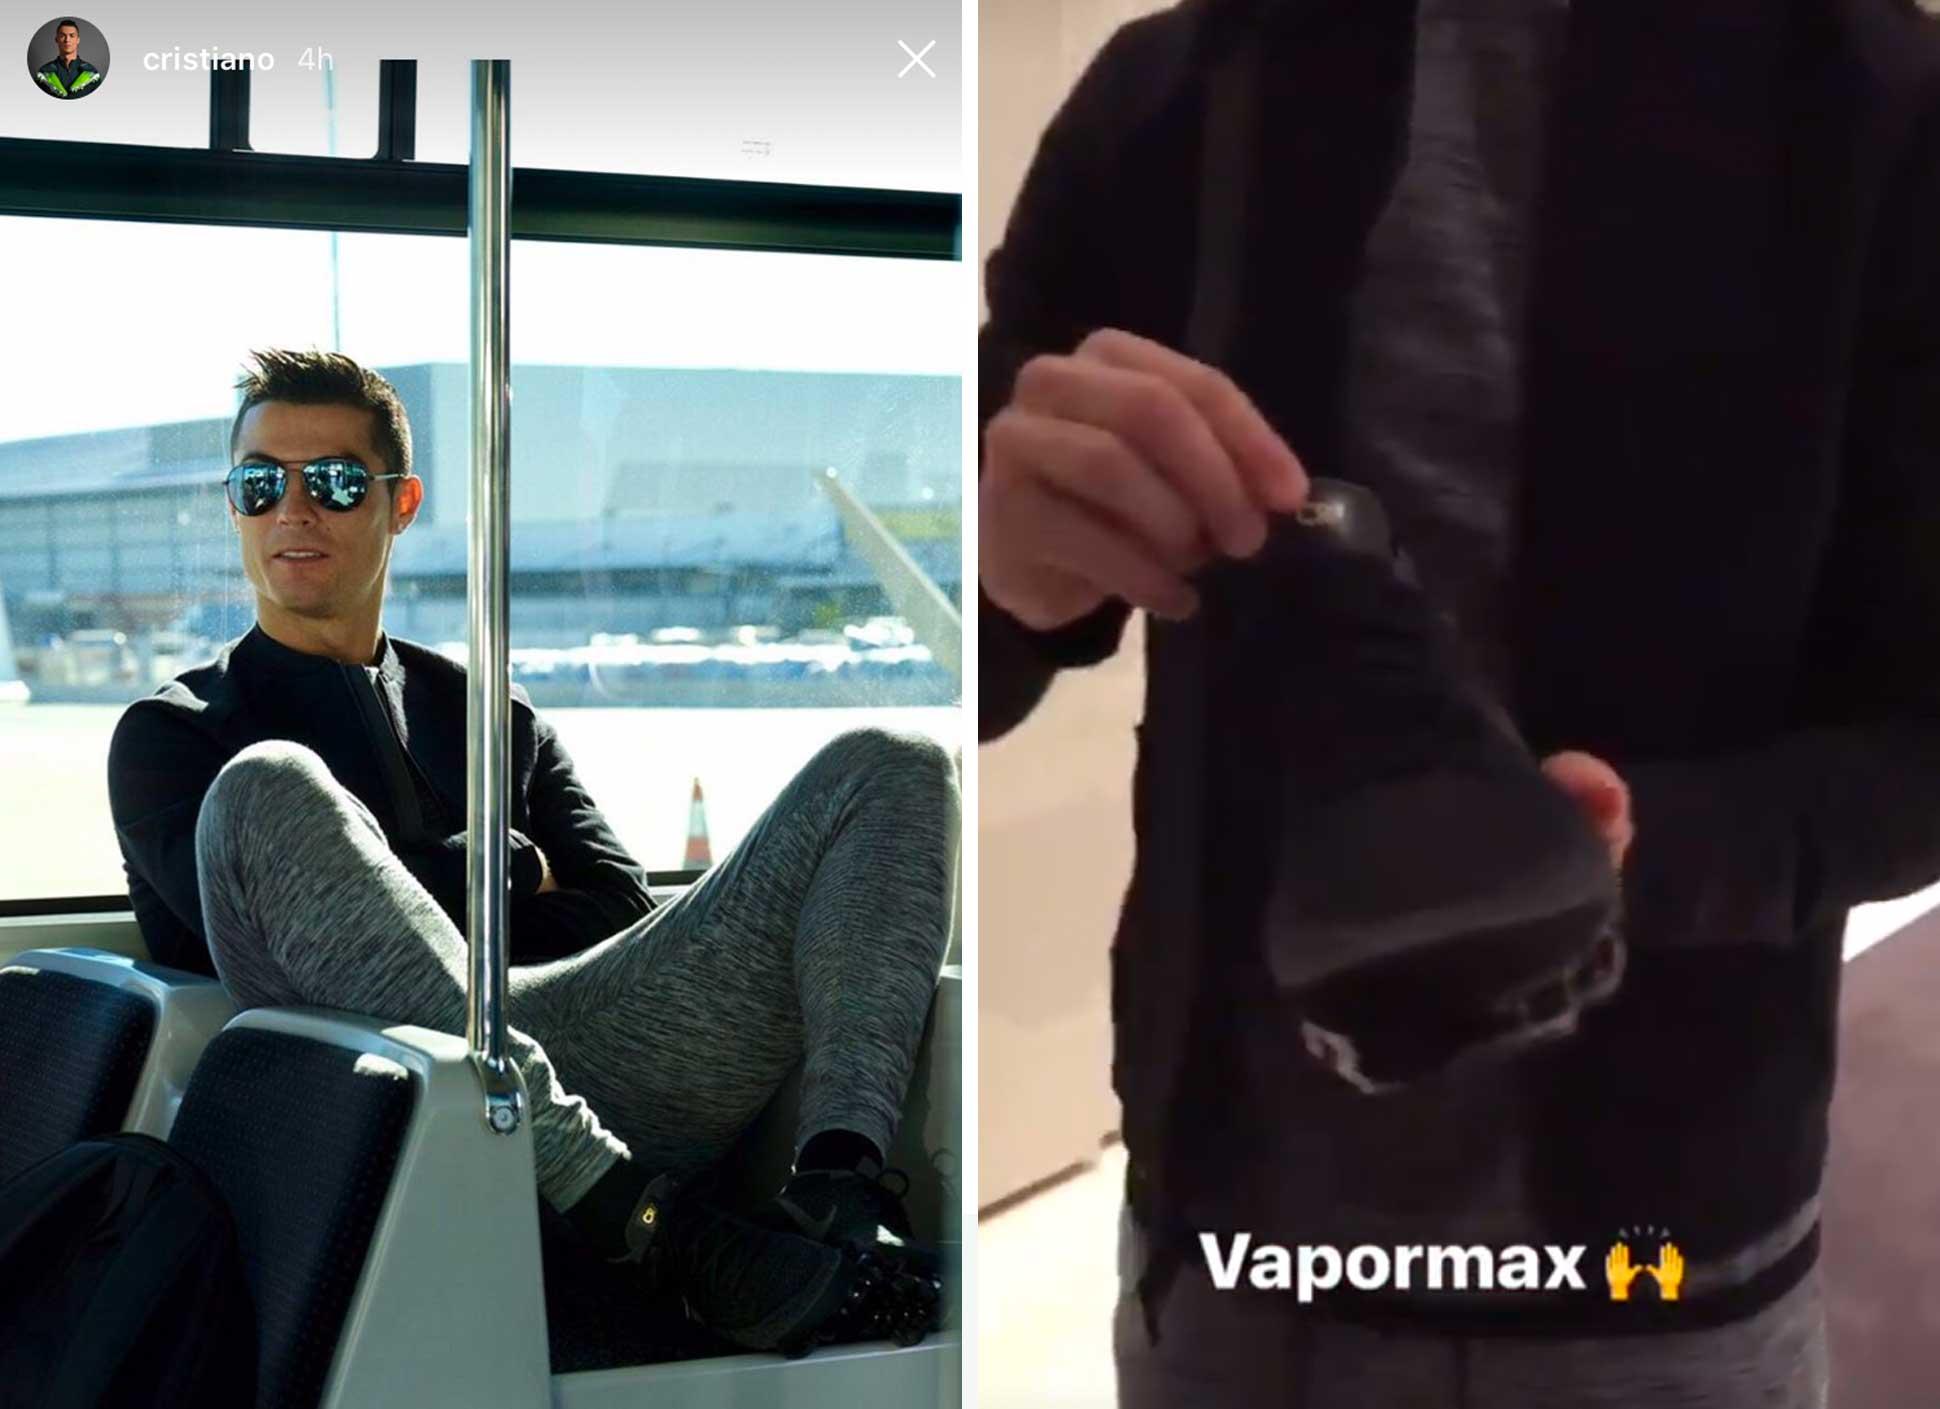 chaussures-sportstyle-cristiano-ronaldo-nike-vapor-max-img3